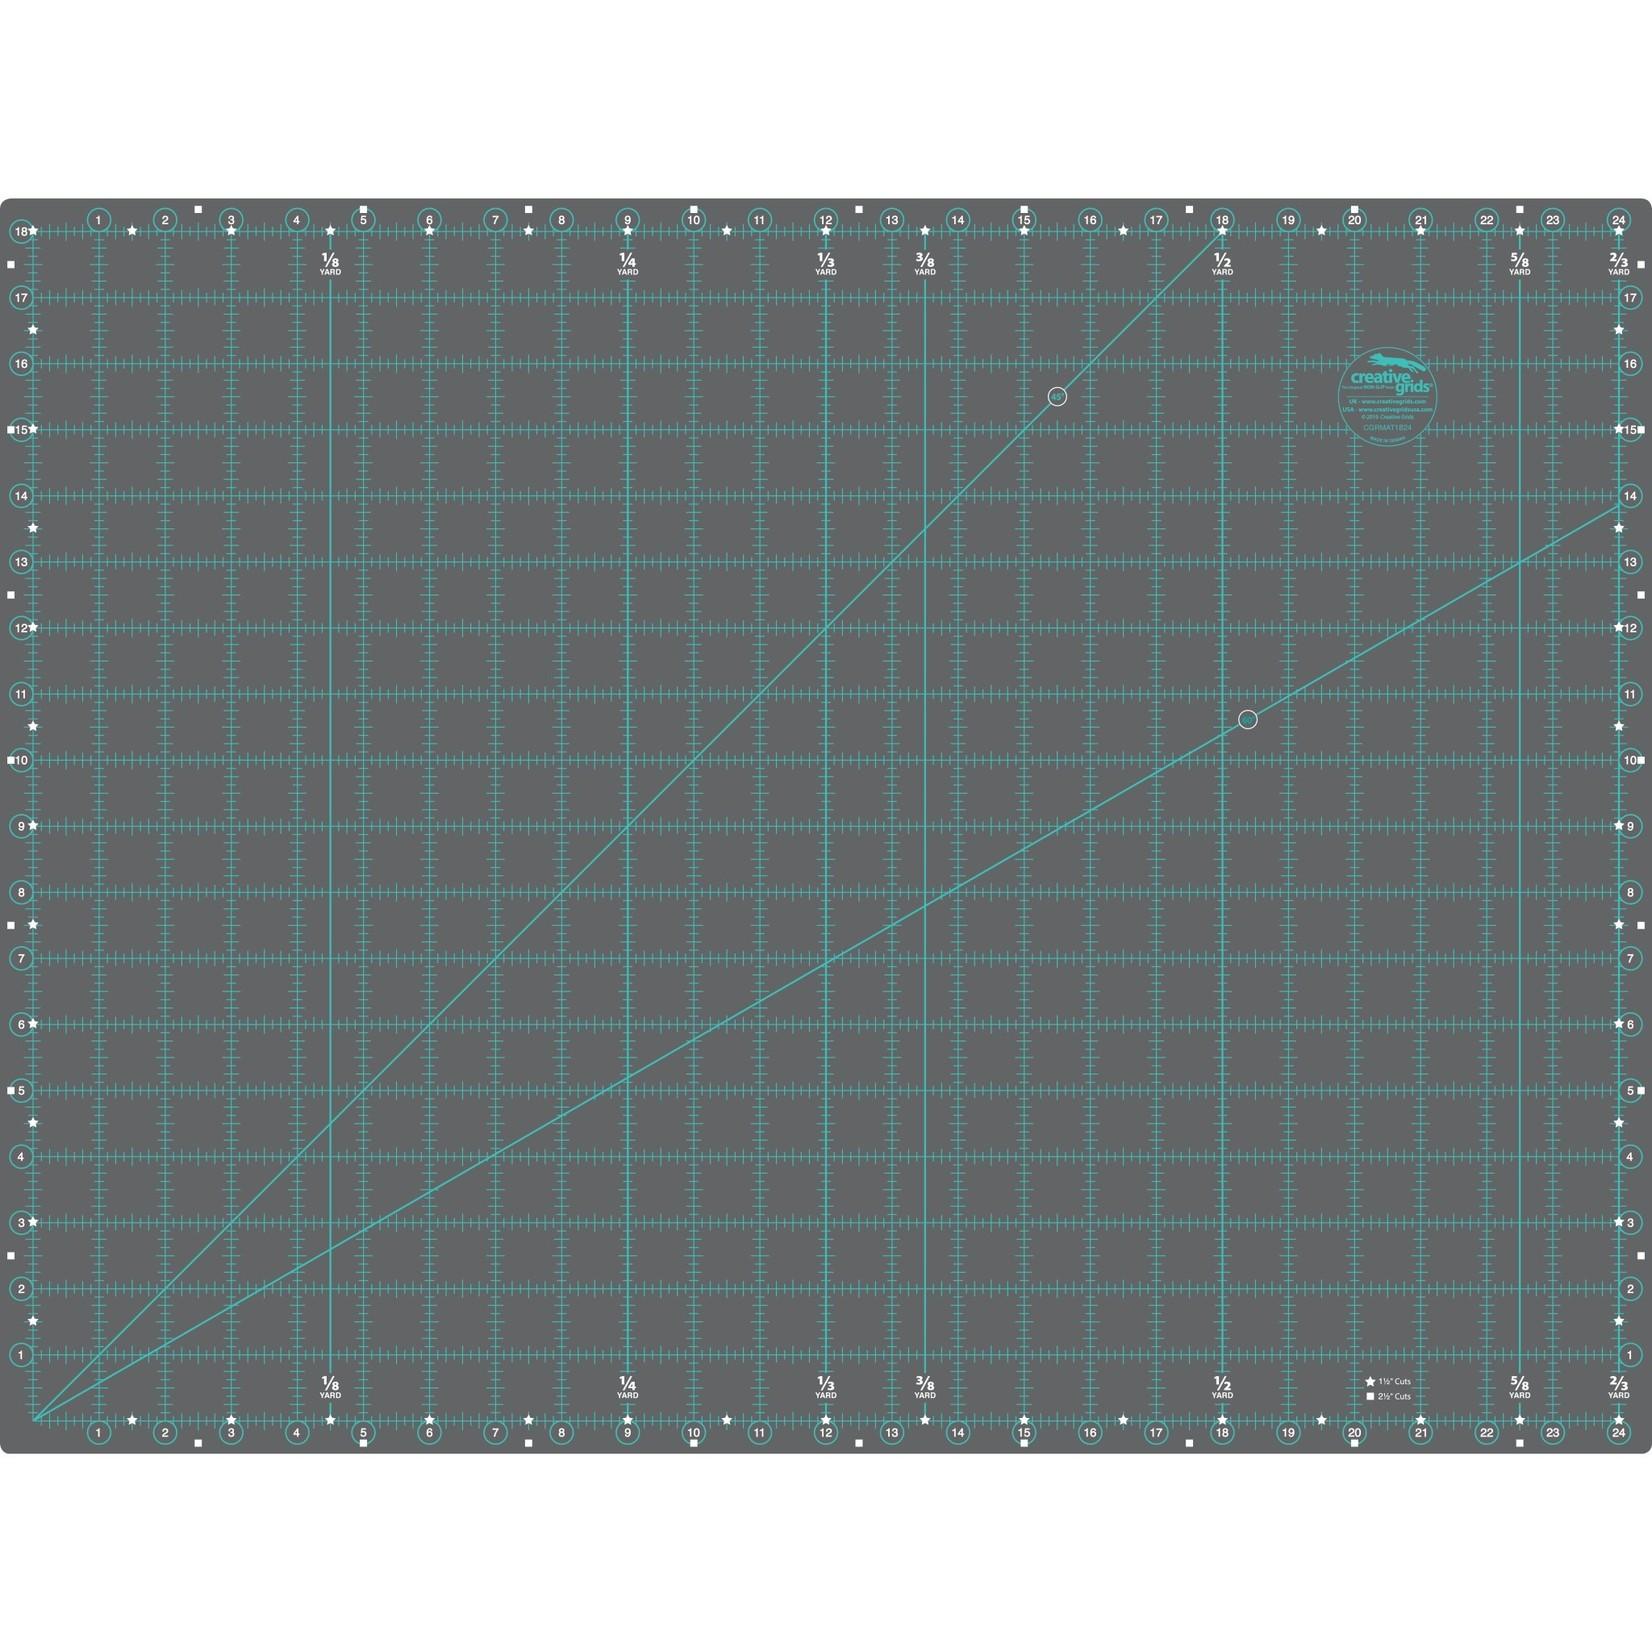 "Creative Grids CREATIVE GRIDS CUTTING MAT DBL. SIDED 24X36"" CGRMAT2436"